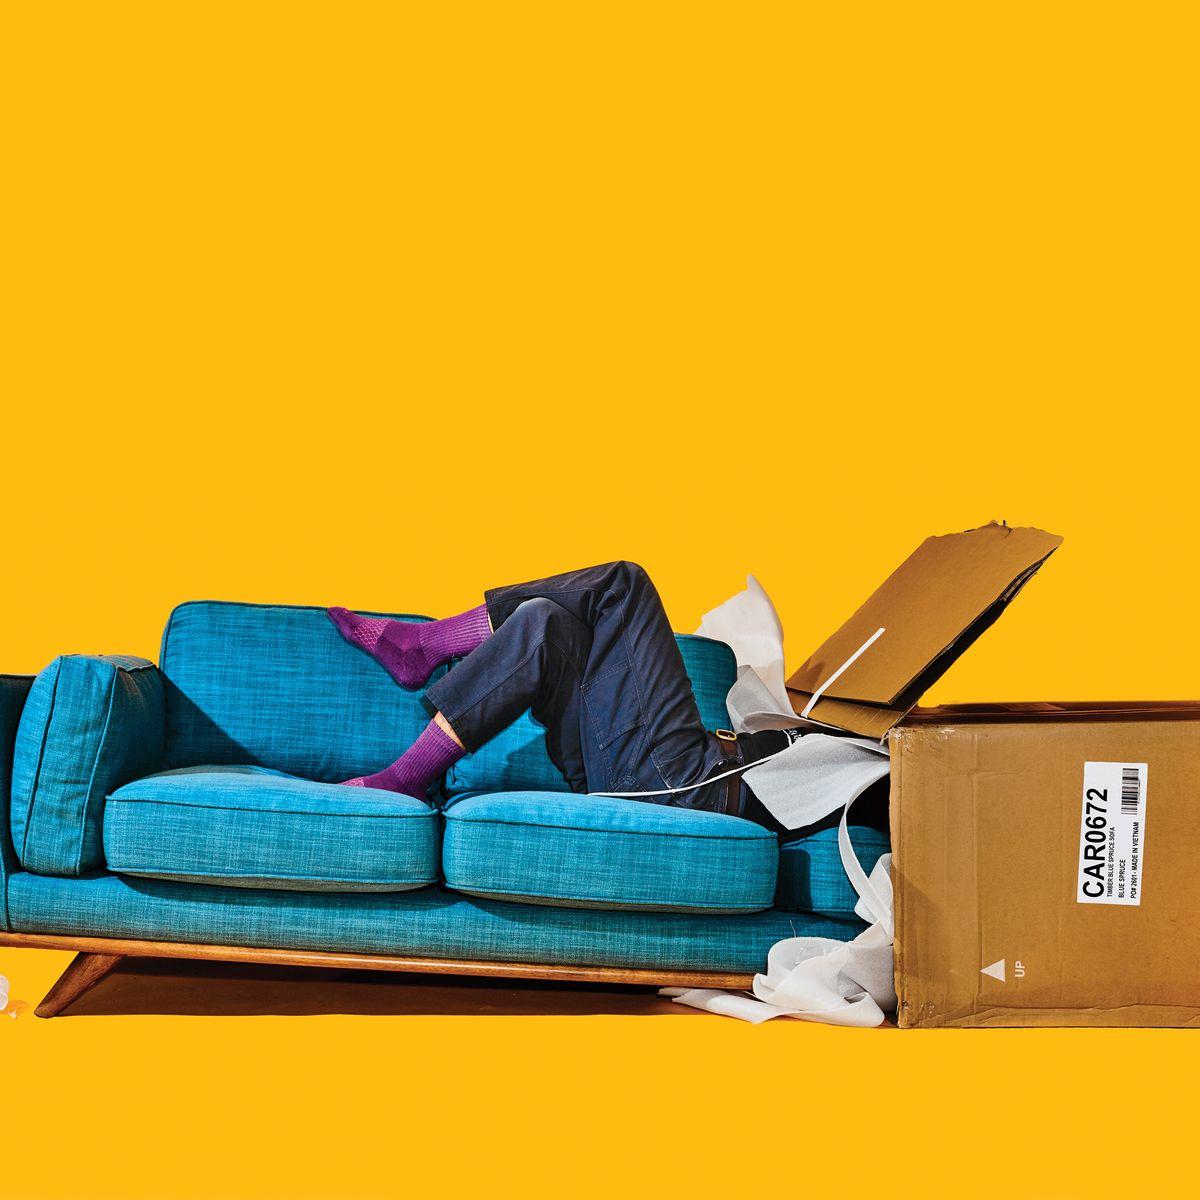 Remarkable 10 Best Flat Pack Sofas Campaign Joybird Burrow 2019 Interior Design Ideas Gentotryabchikinfo